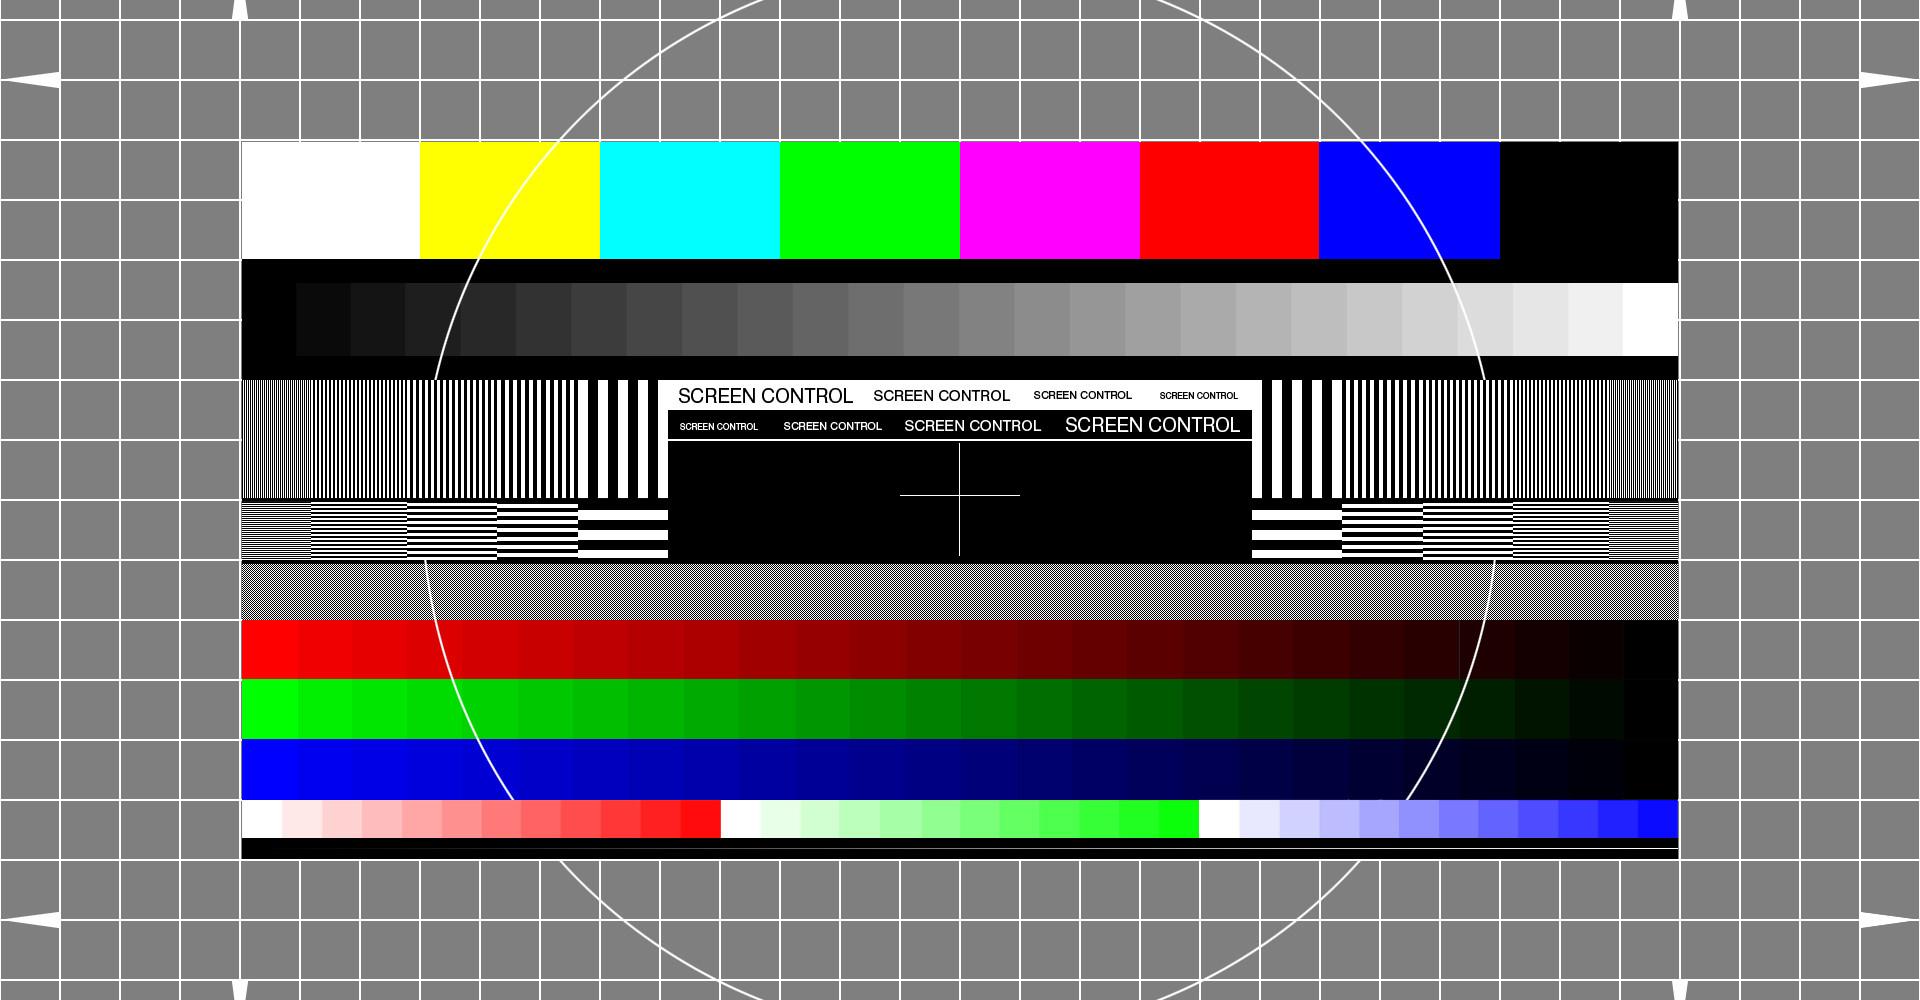 Monitor-Testbild